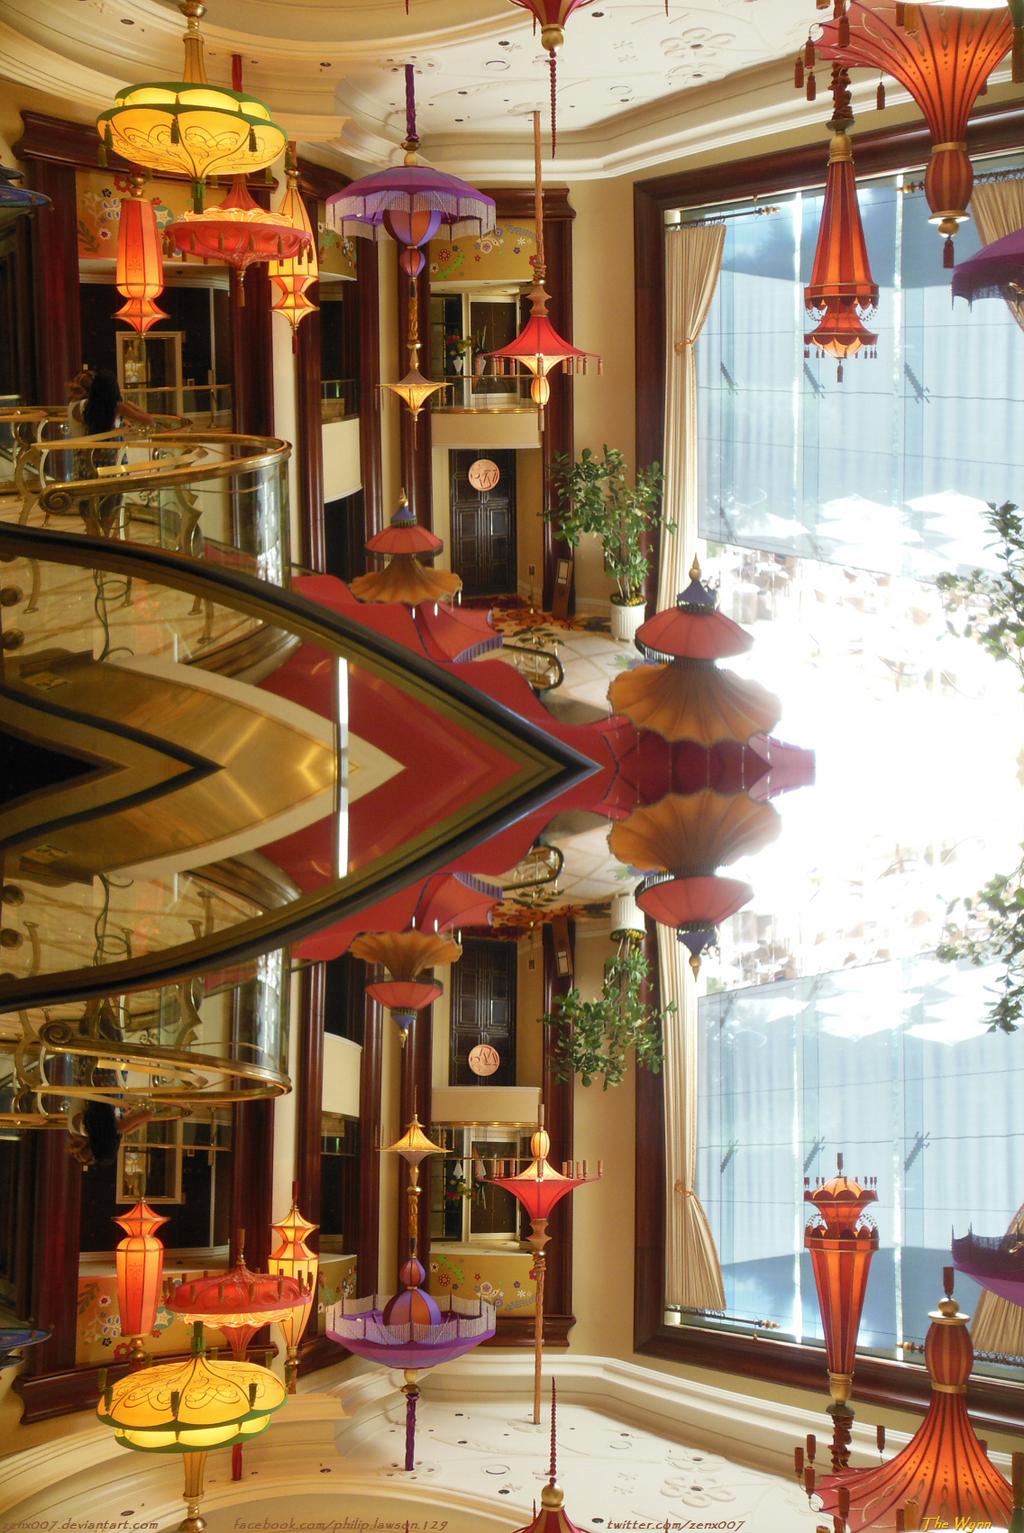 Wynn hotel and casino flipshot by zenx007 on deviantart for Wynn hotel decor